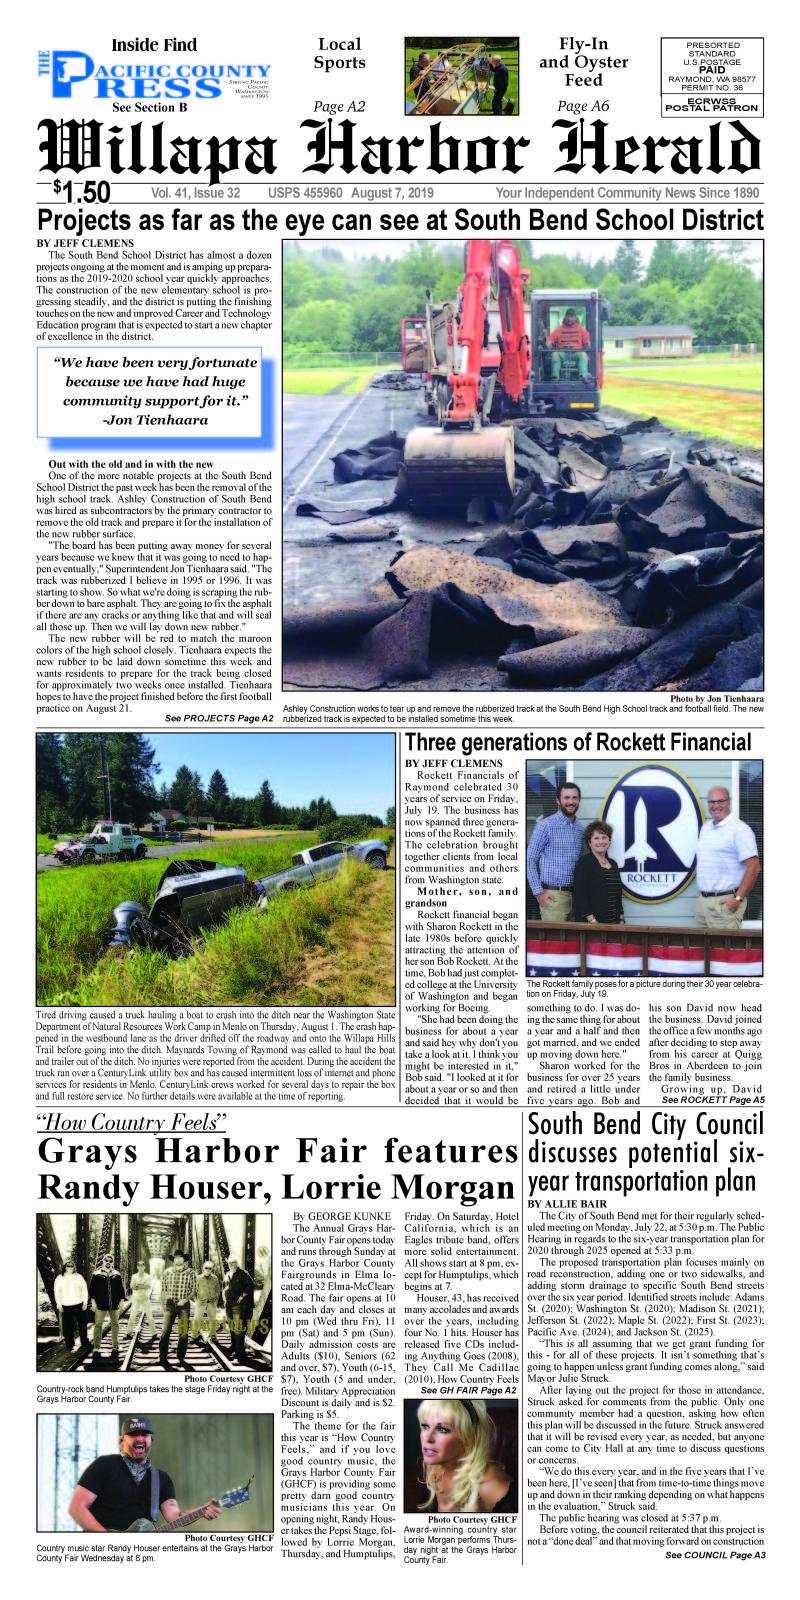 August 7, 2019 Willapa Harbor Herald